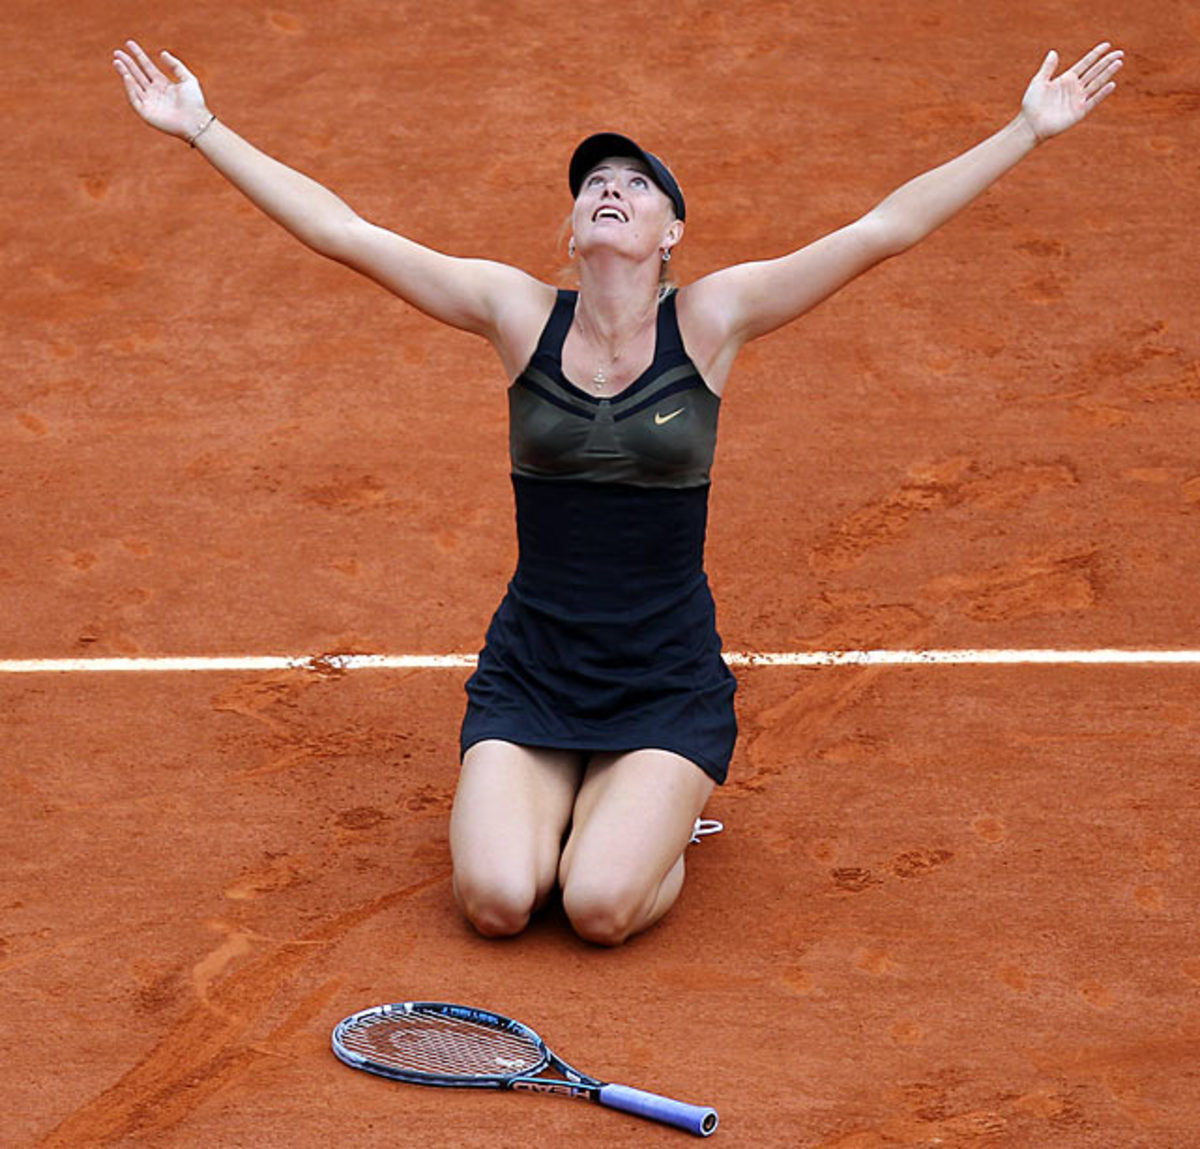 APTOPIX-France-Tennis-%285%29.jpg